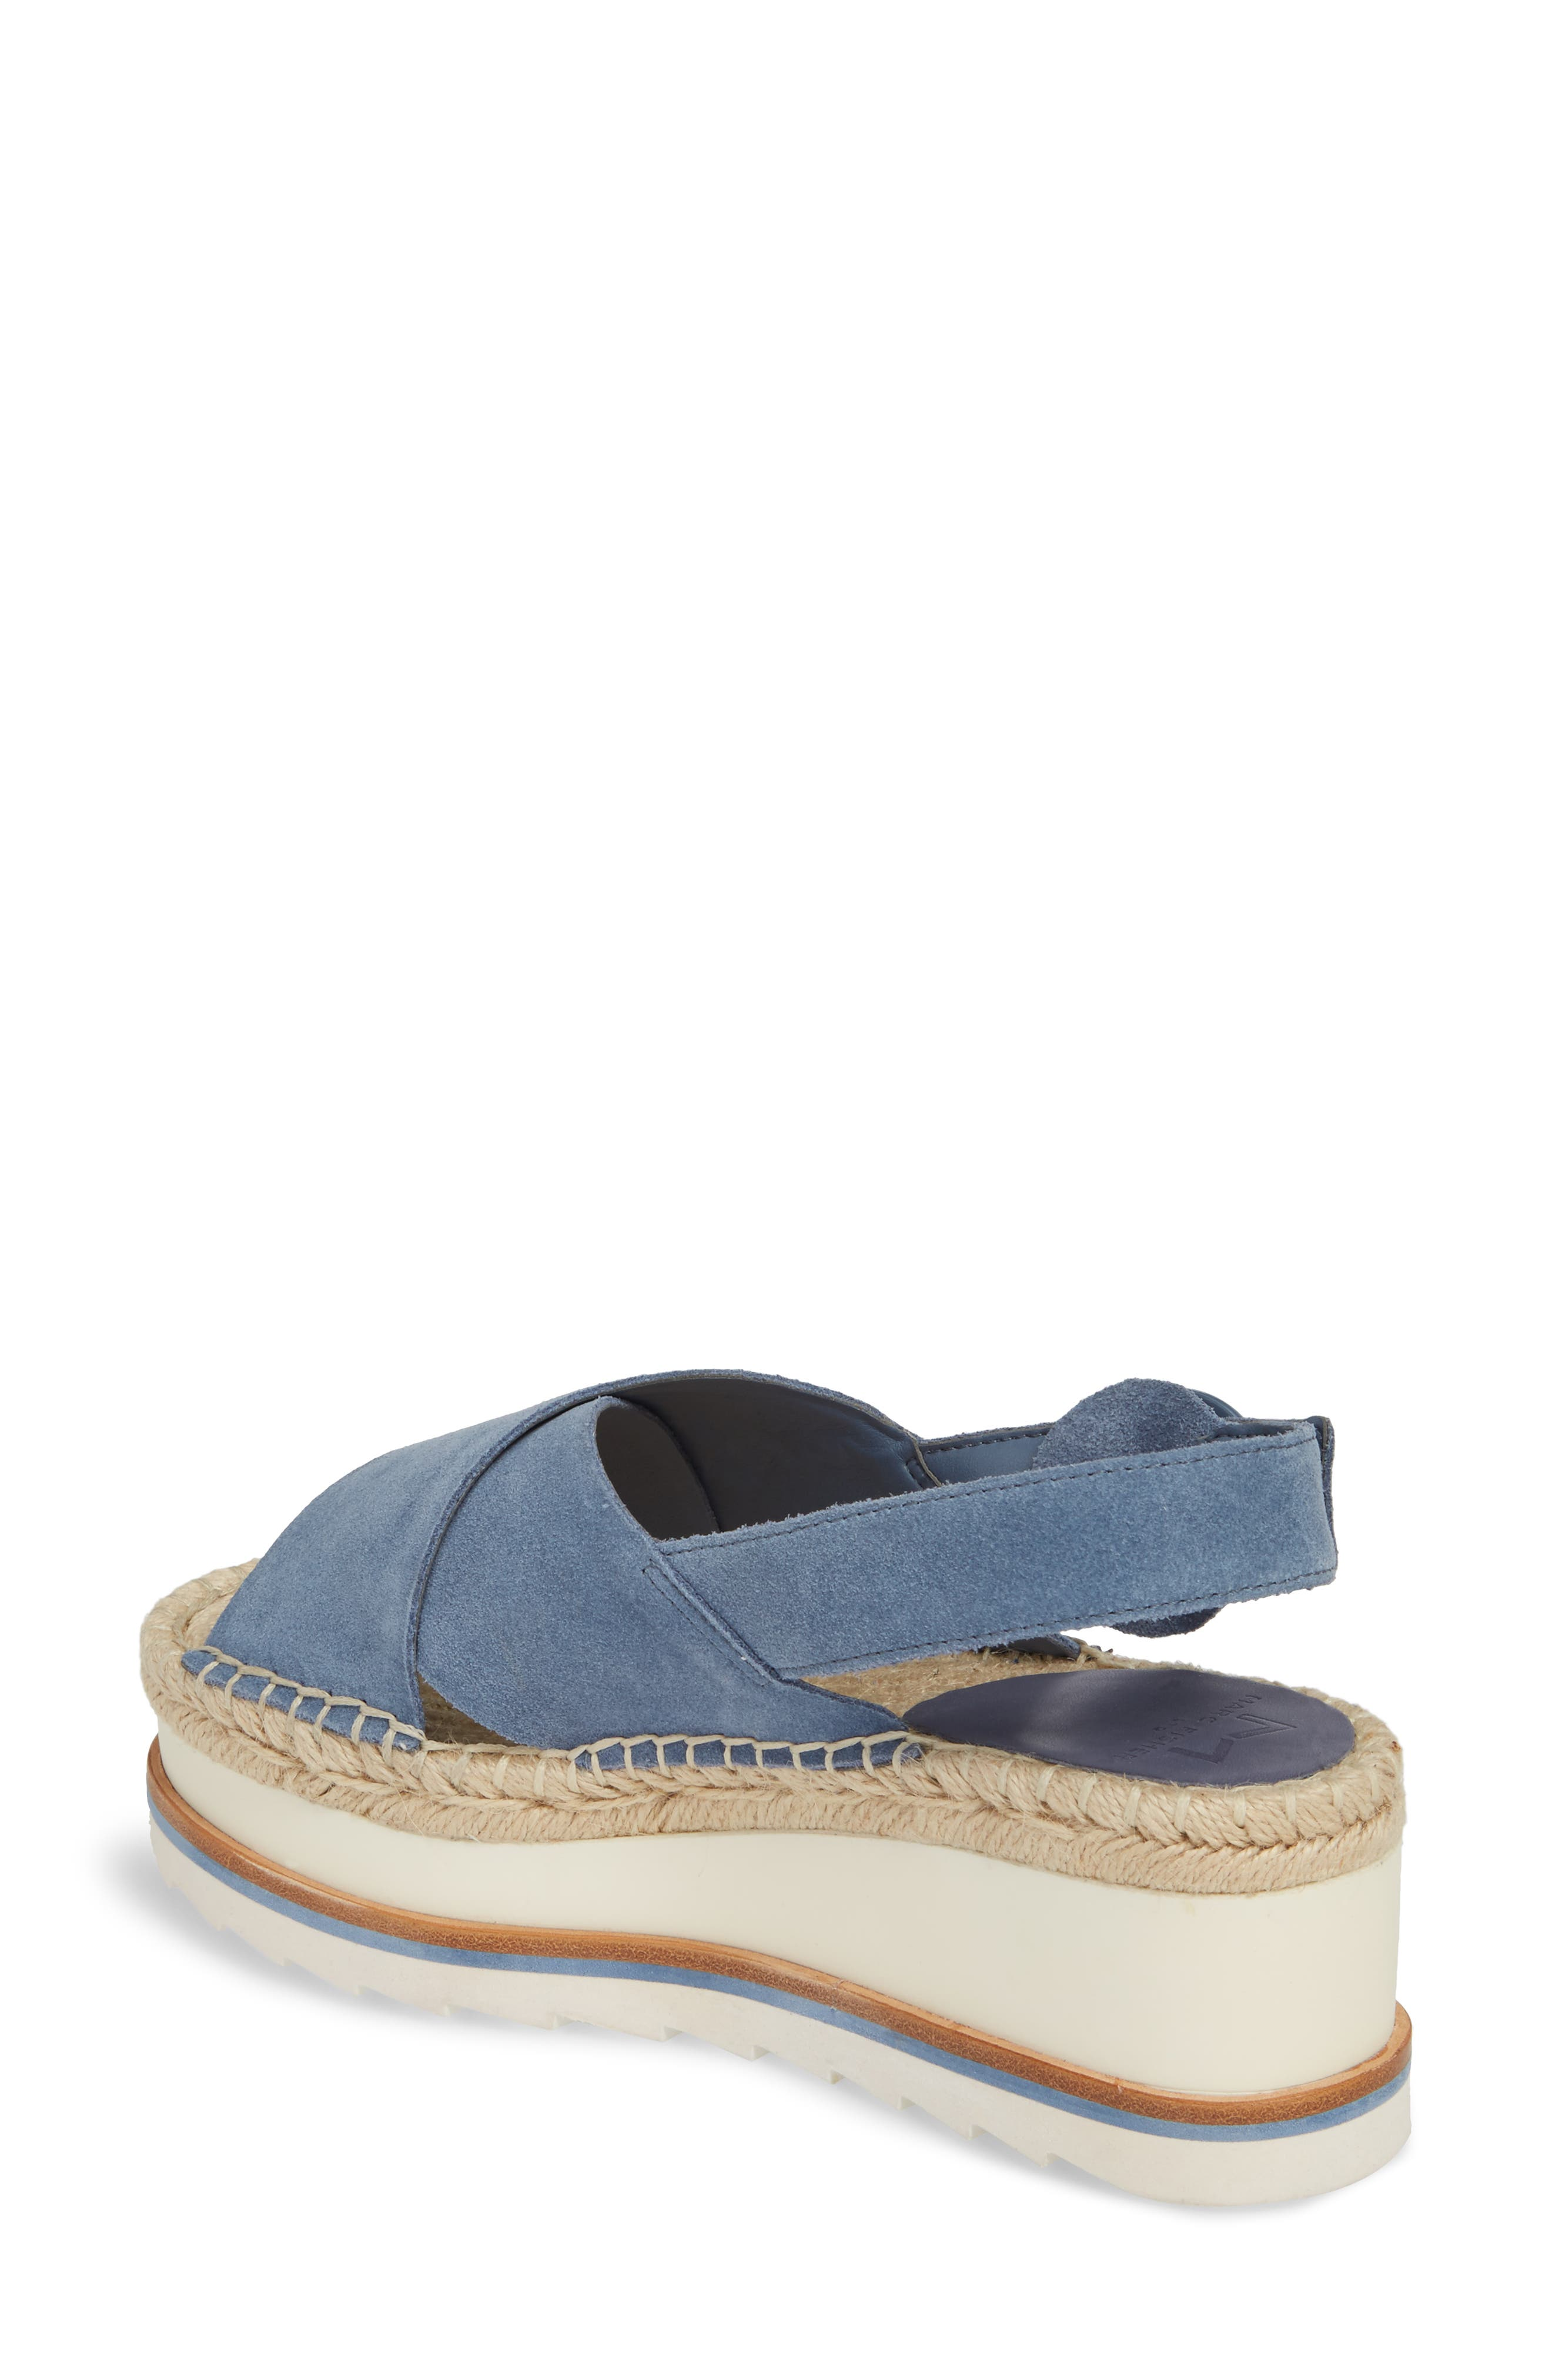 Glenna Platform Slingback Sandal,                             Alternate thumbnail 7, color,